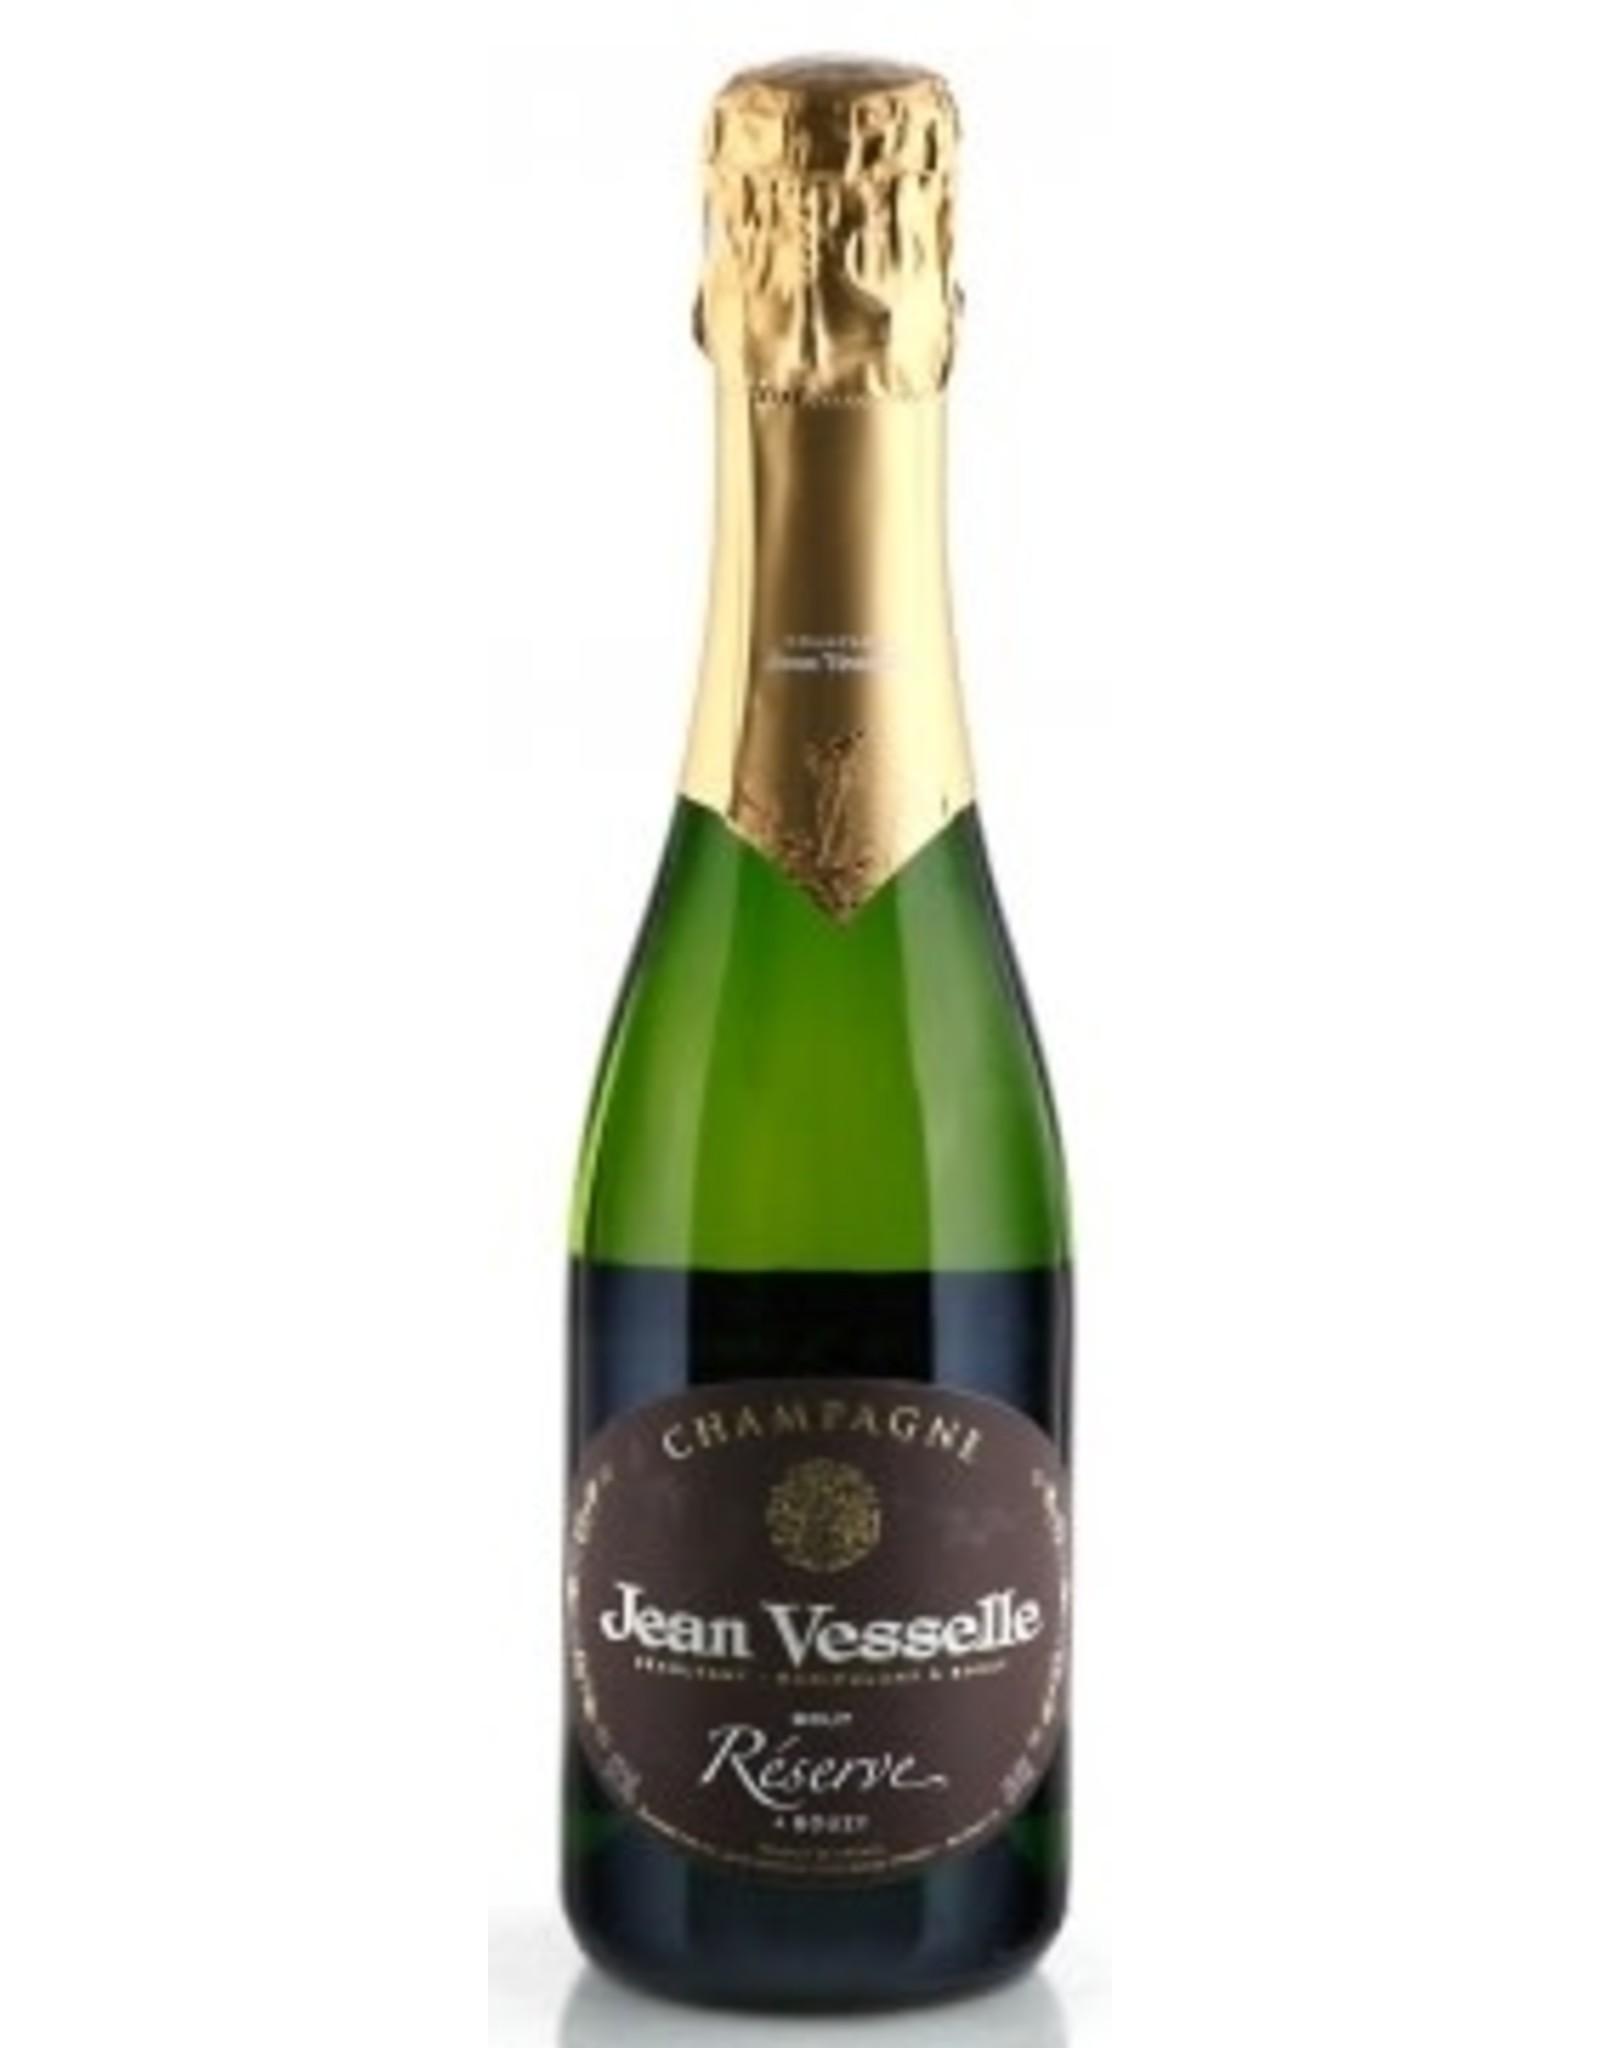 Jean Vesselle Champagne Jean Vesselle Brut Reserve, Bouzy NV 375ml